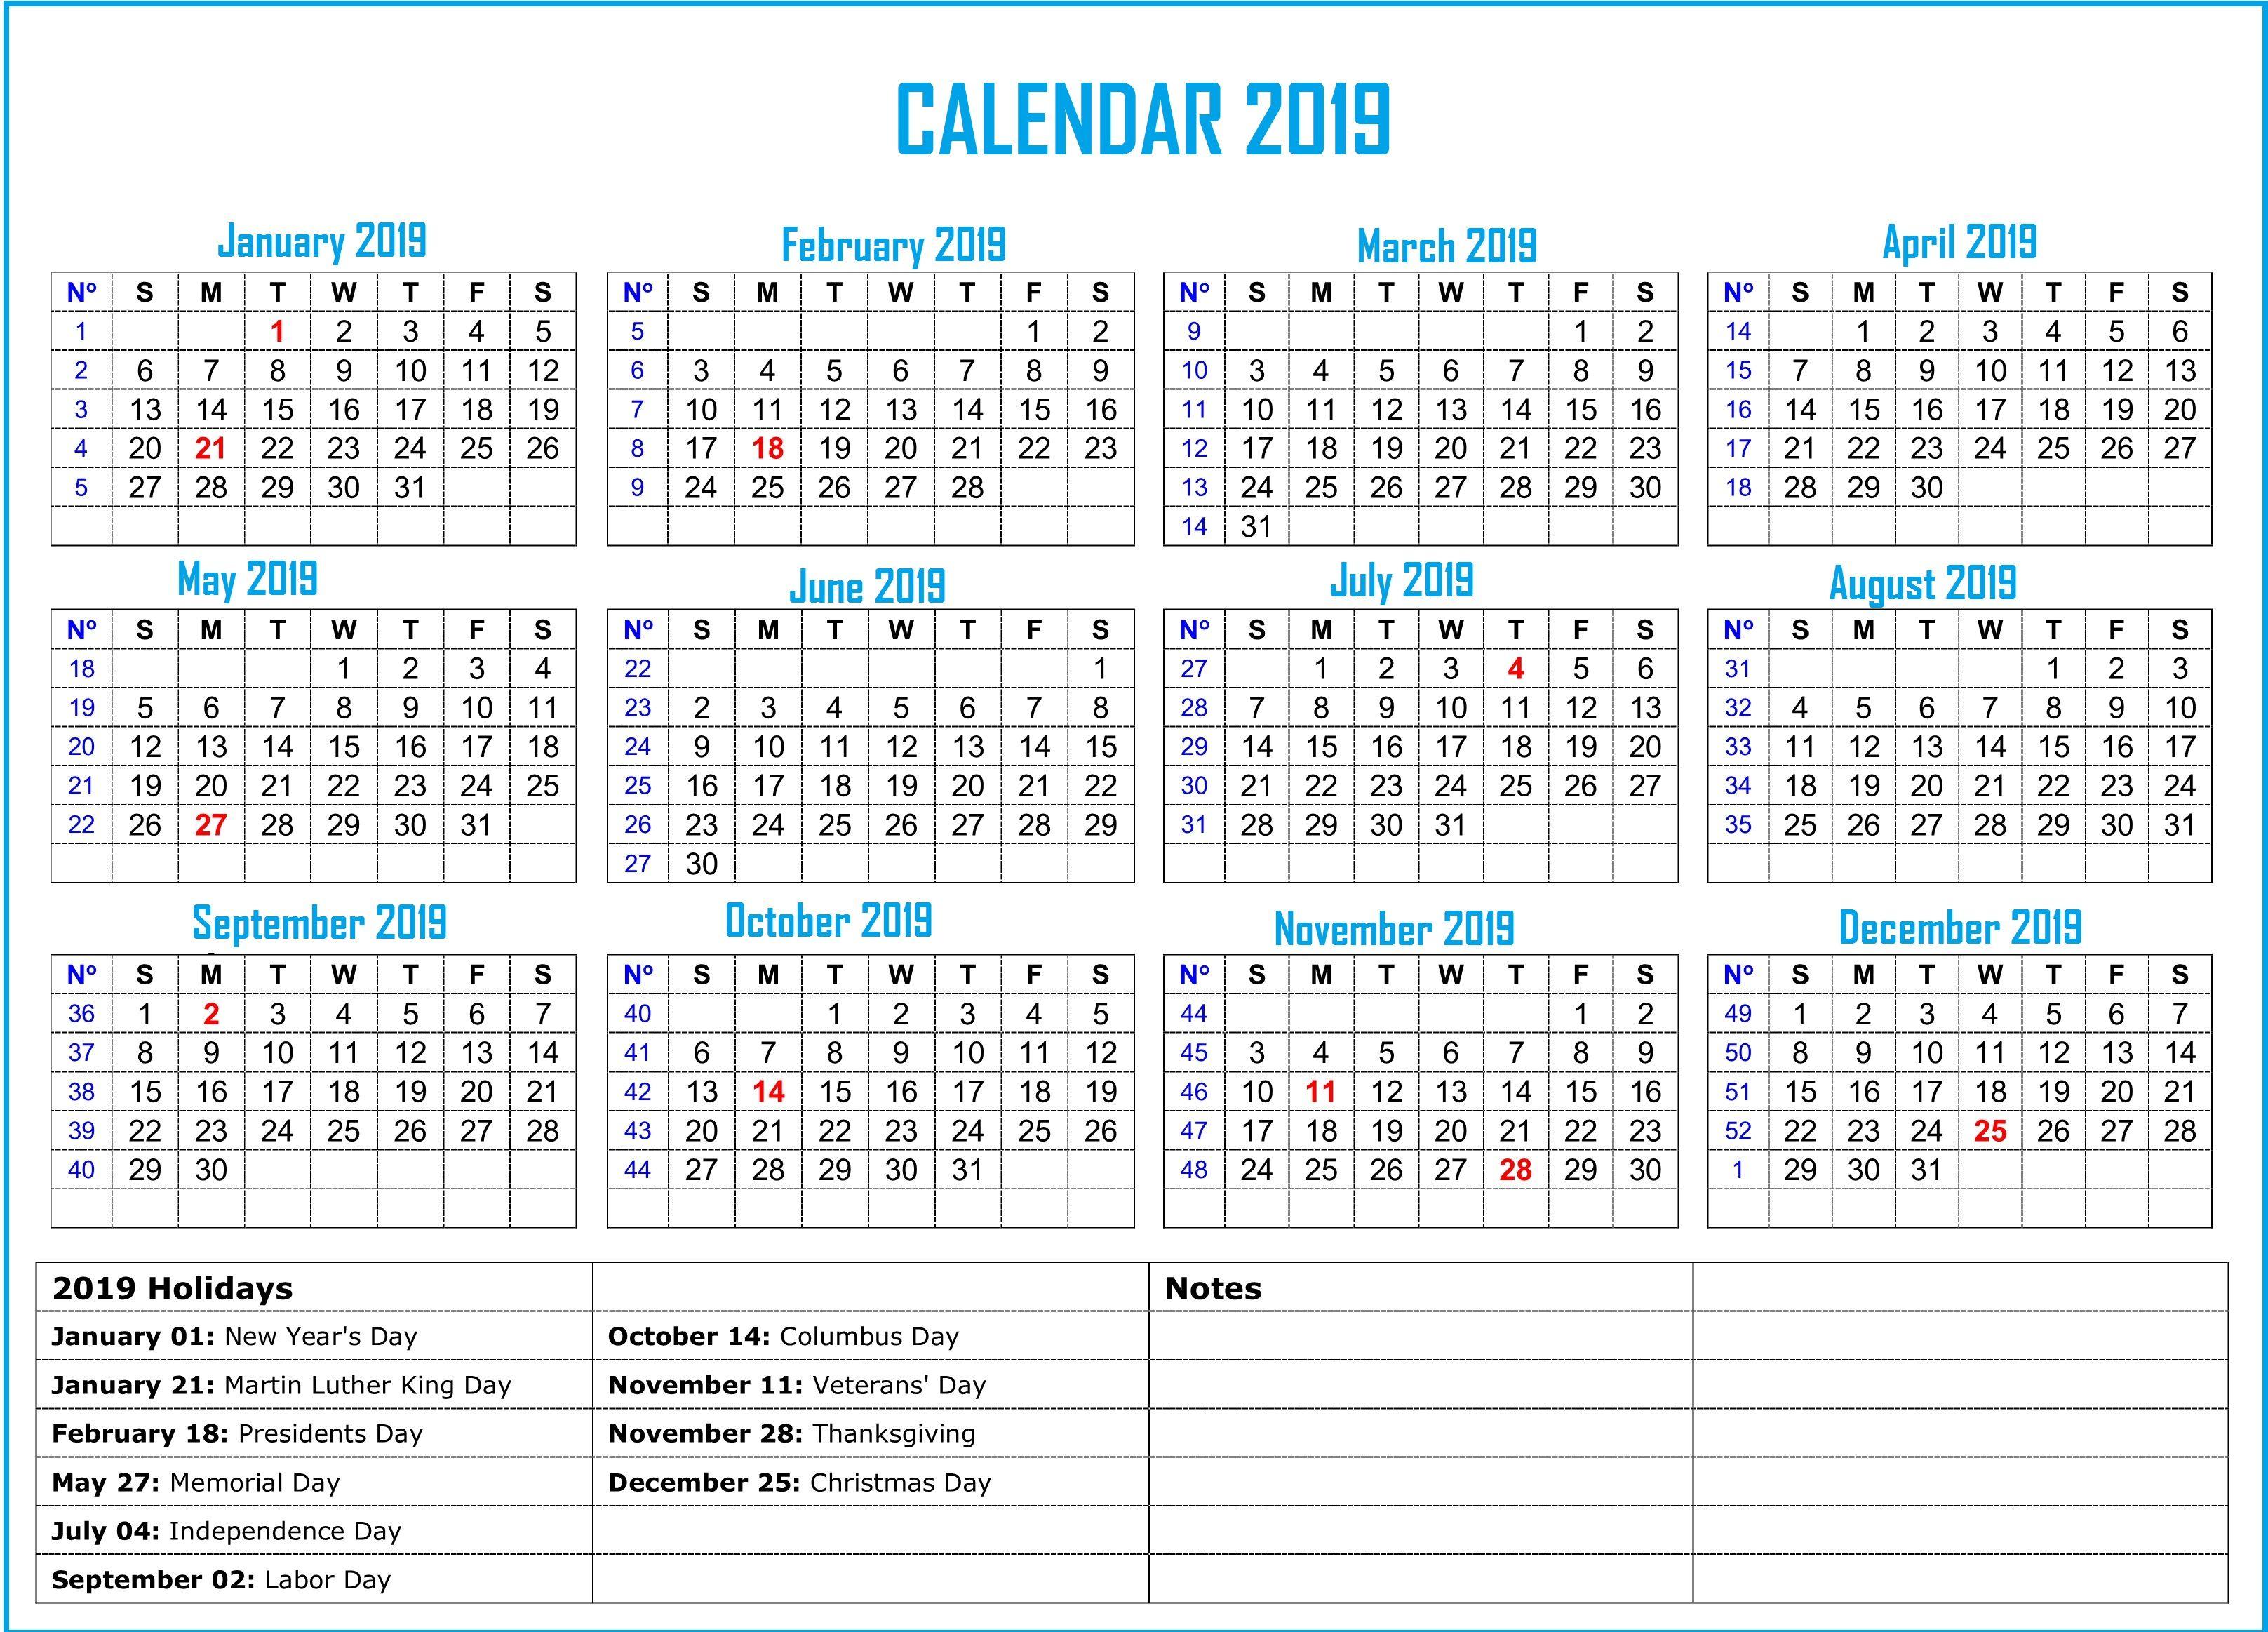 2019 Holidays Calendar | Monthly Calendar Templates | Us